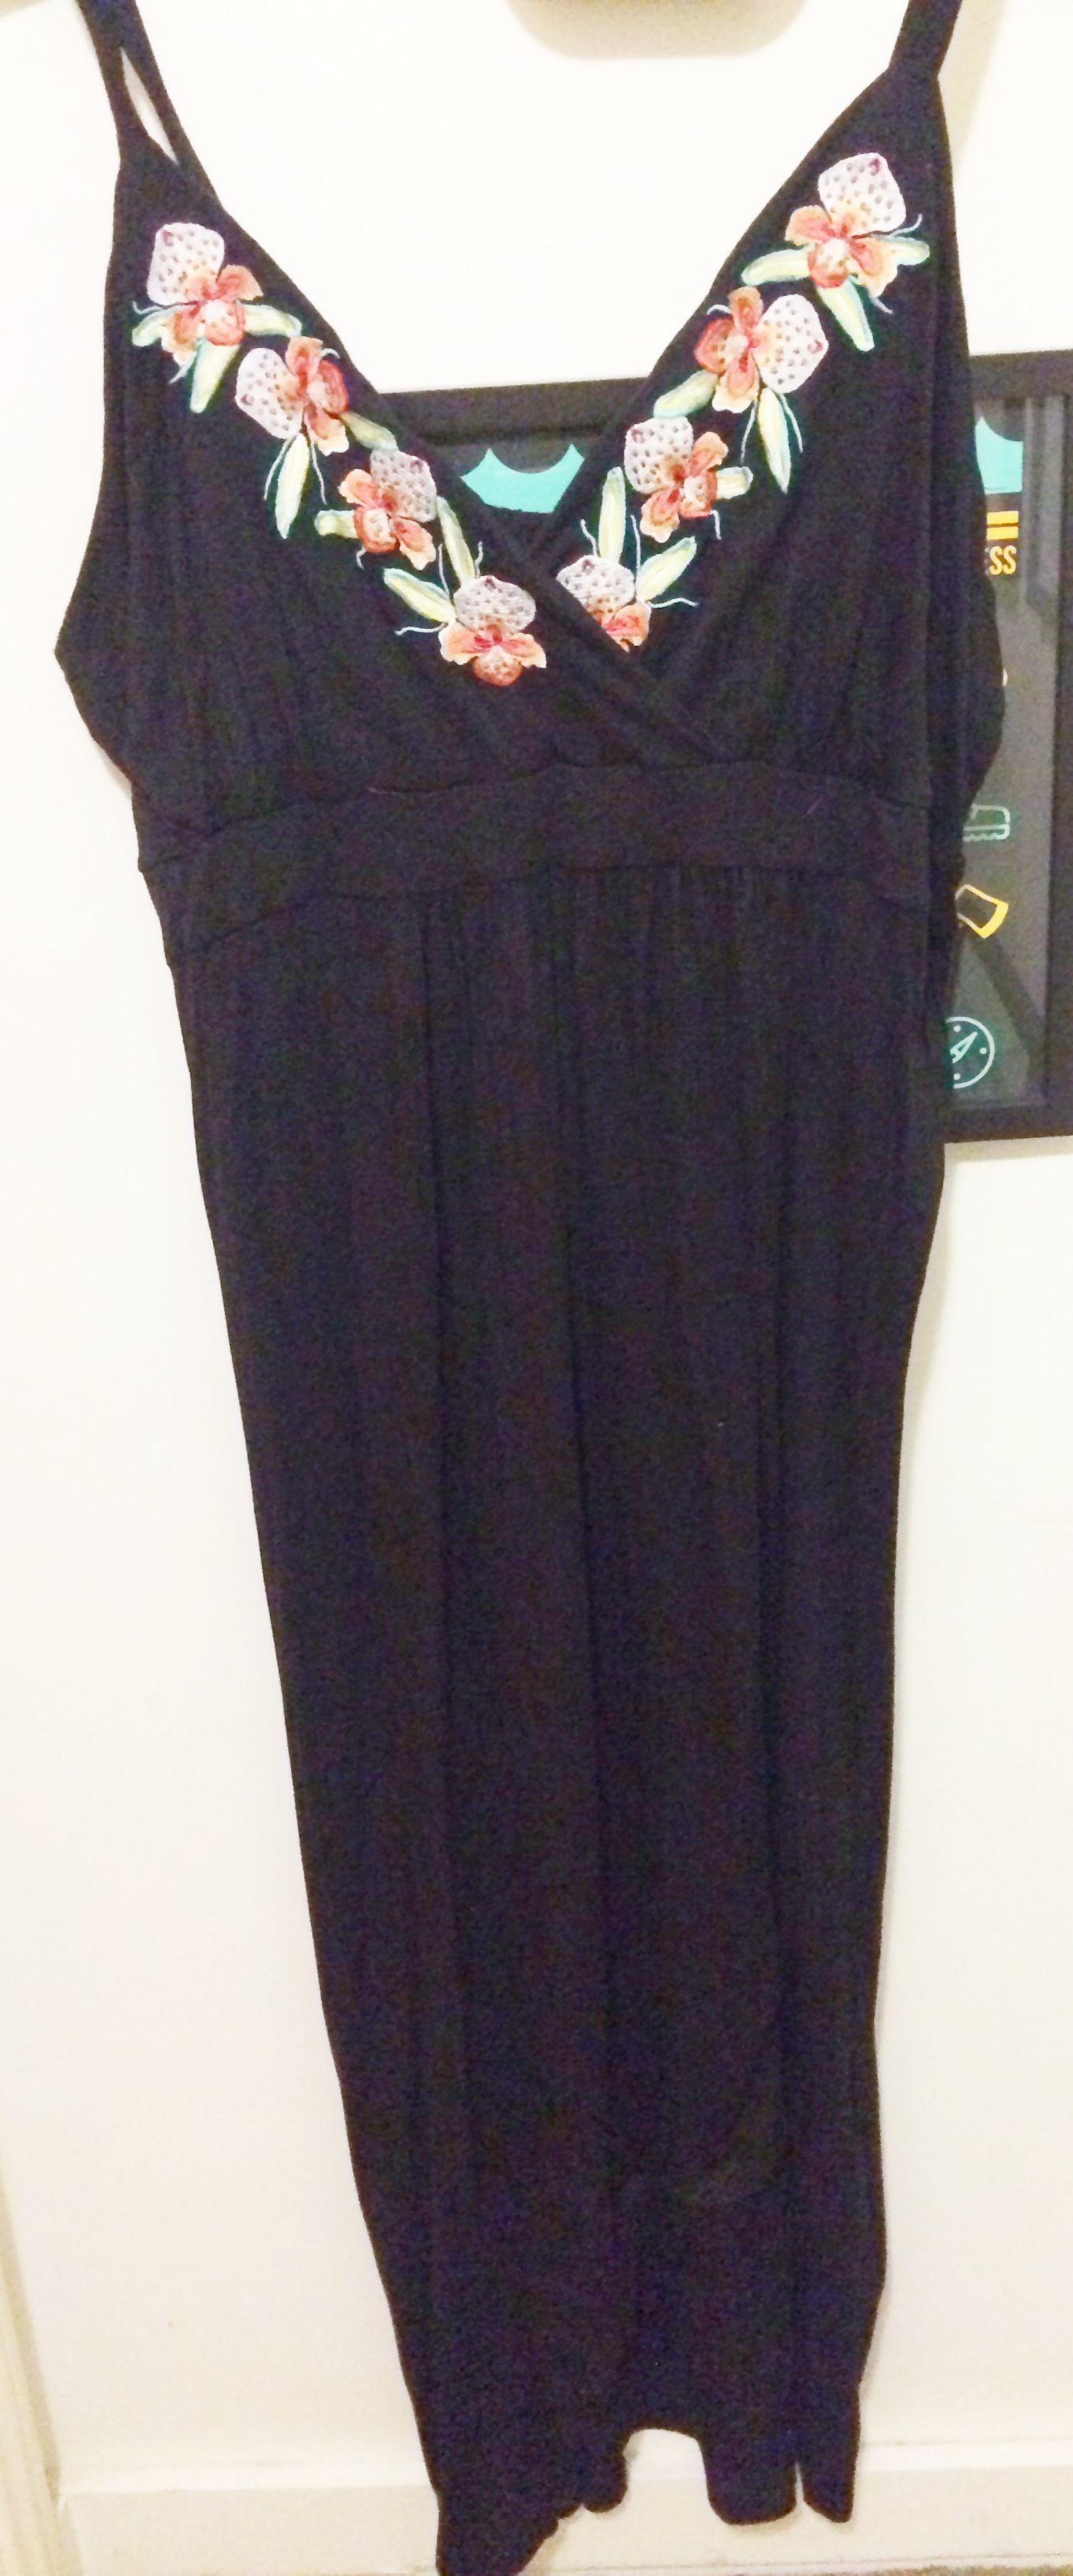 3x American Rag Frm Macy S Maxi Dress Very Stretchy Jersey 31 Shipped Tank Top Fashion Maxi Dress Fashion [ 3264 x 1359 Pixel ]